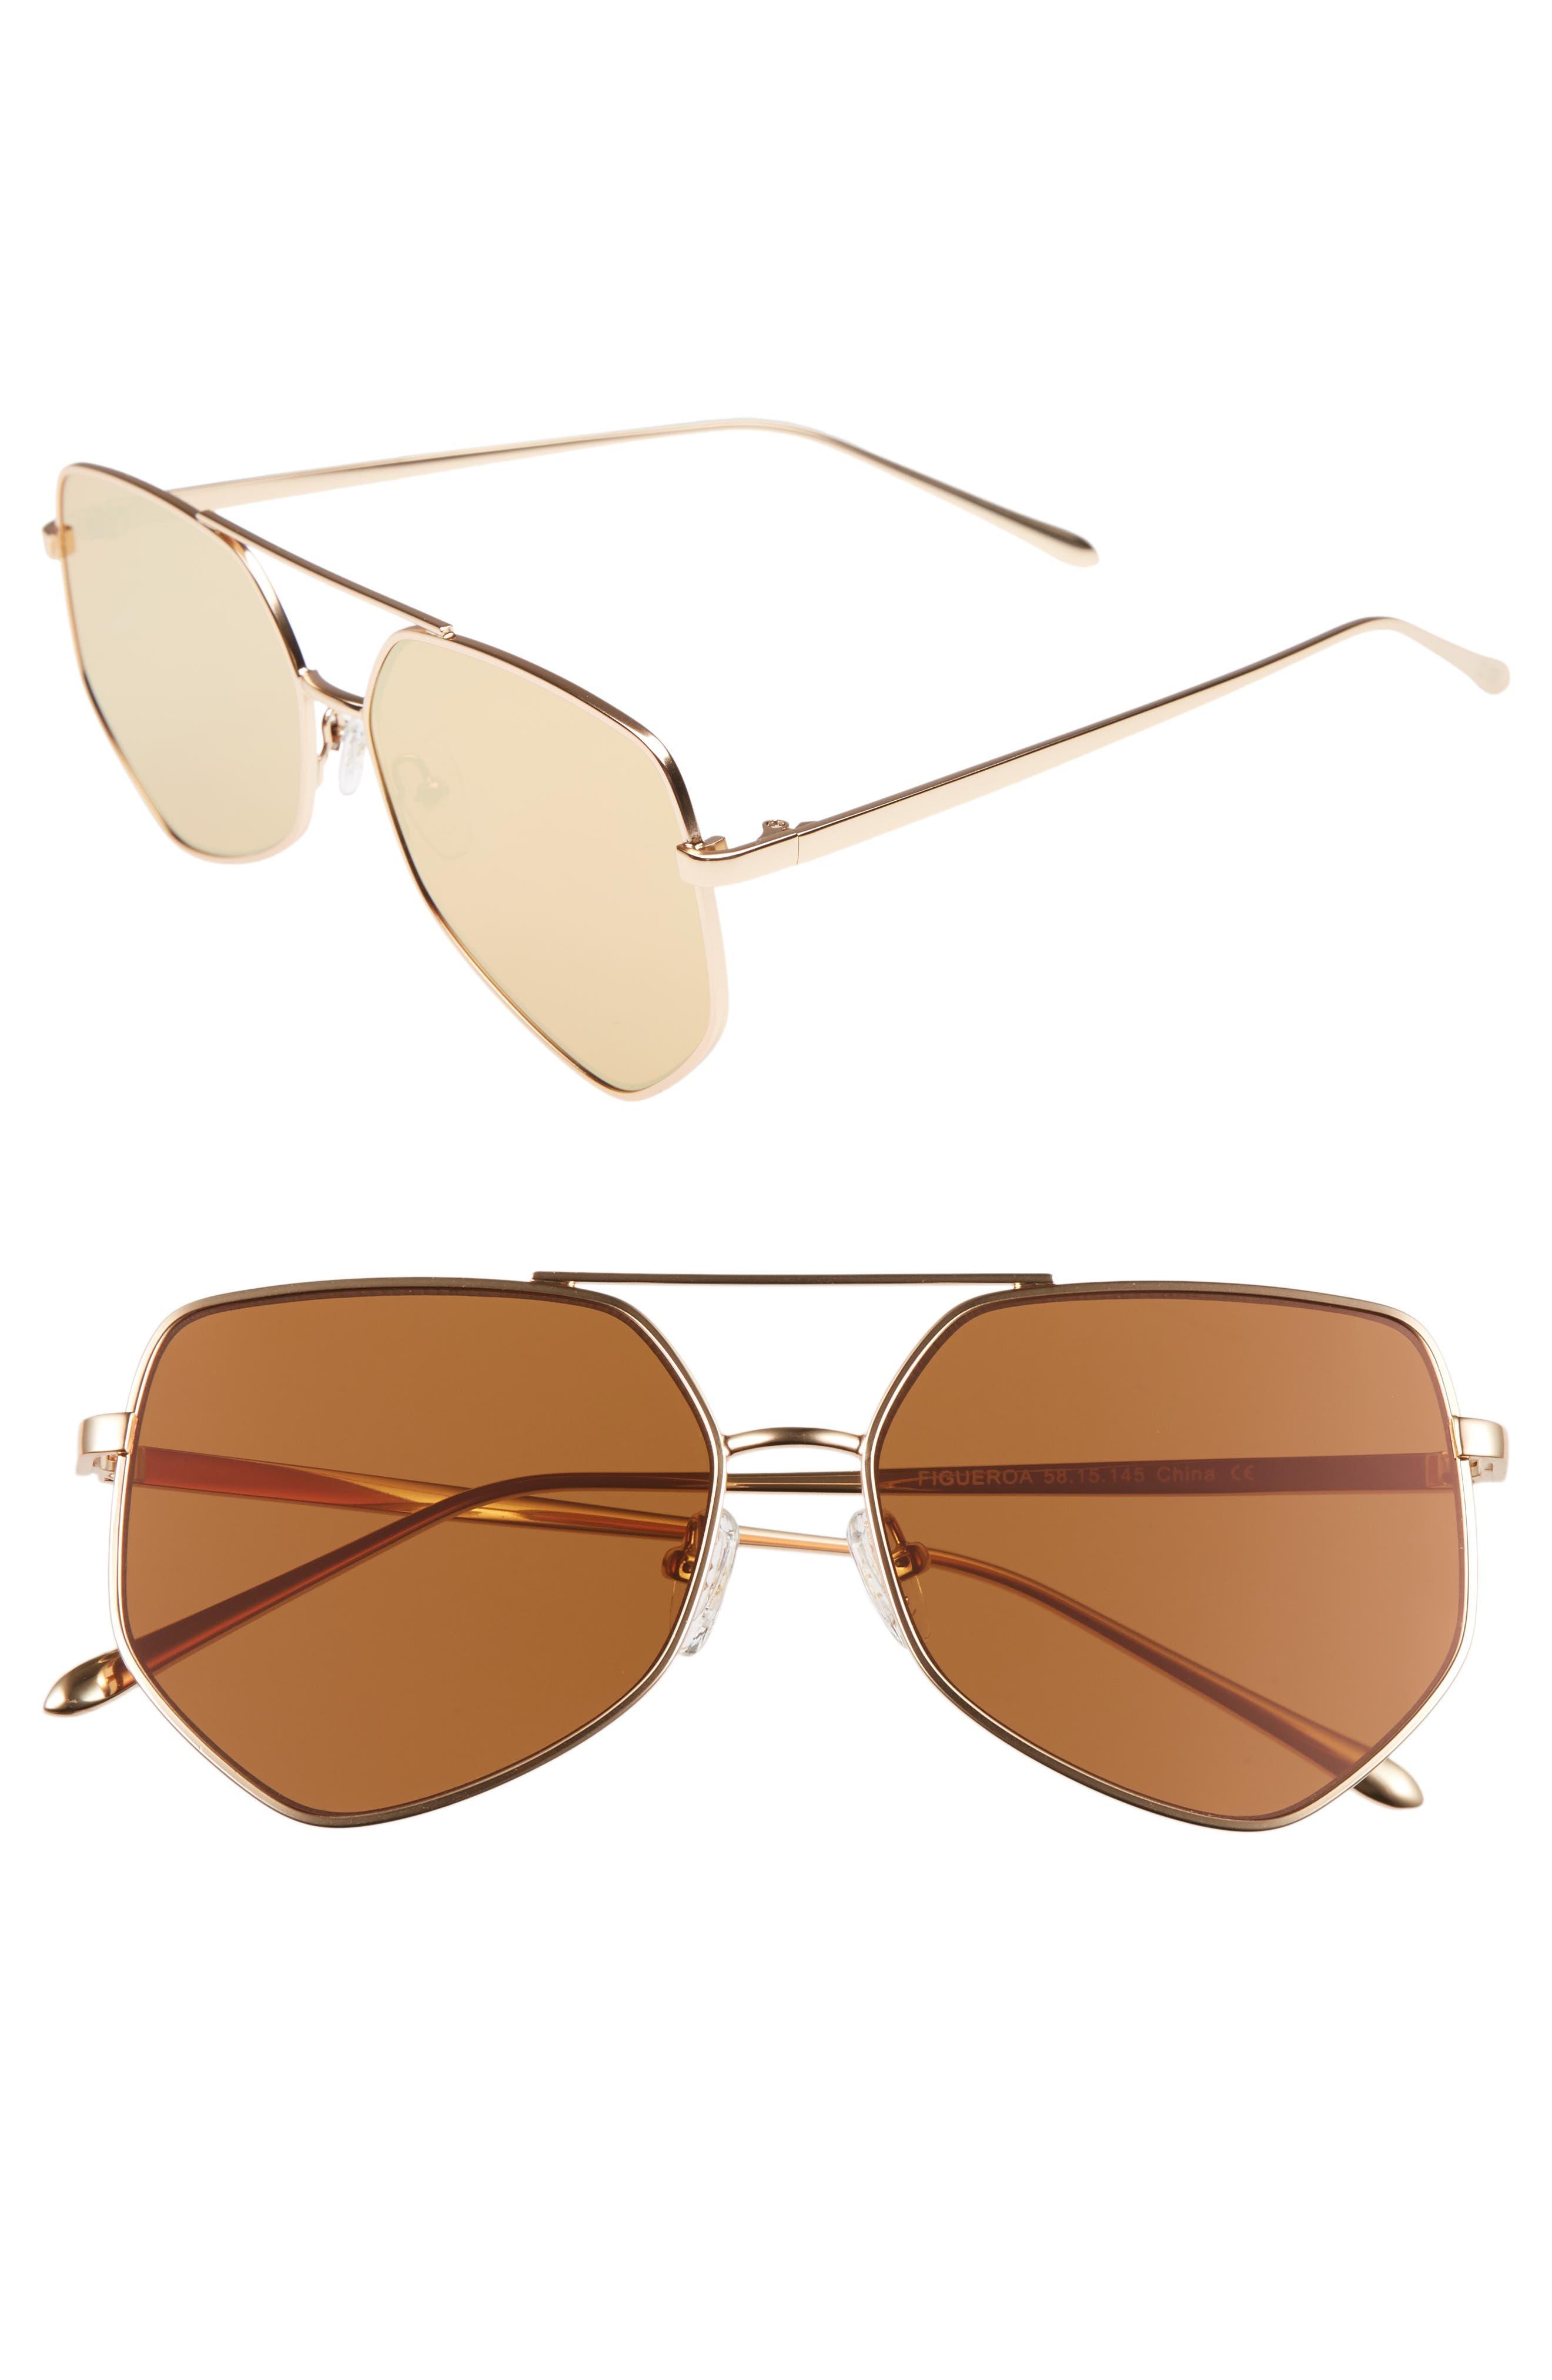 Alternate Image 1 Selected - Bonnie Clyde Figueroa 58mm Sunglasses